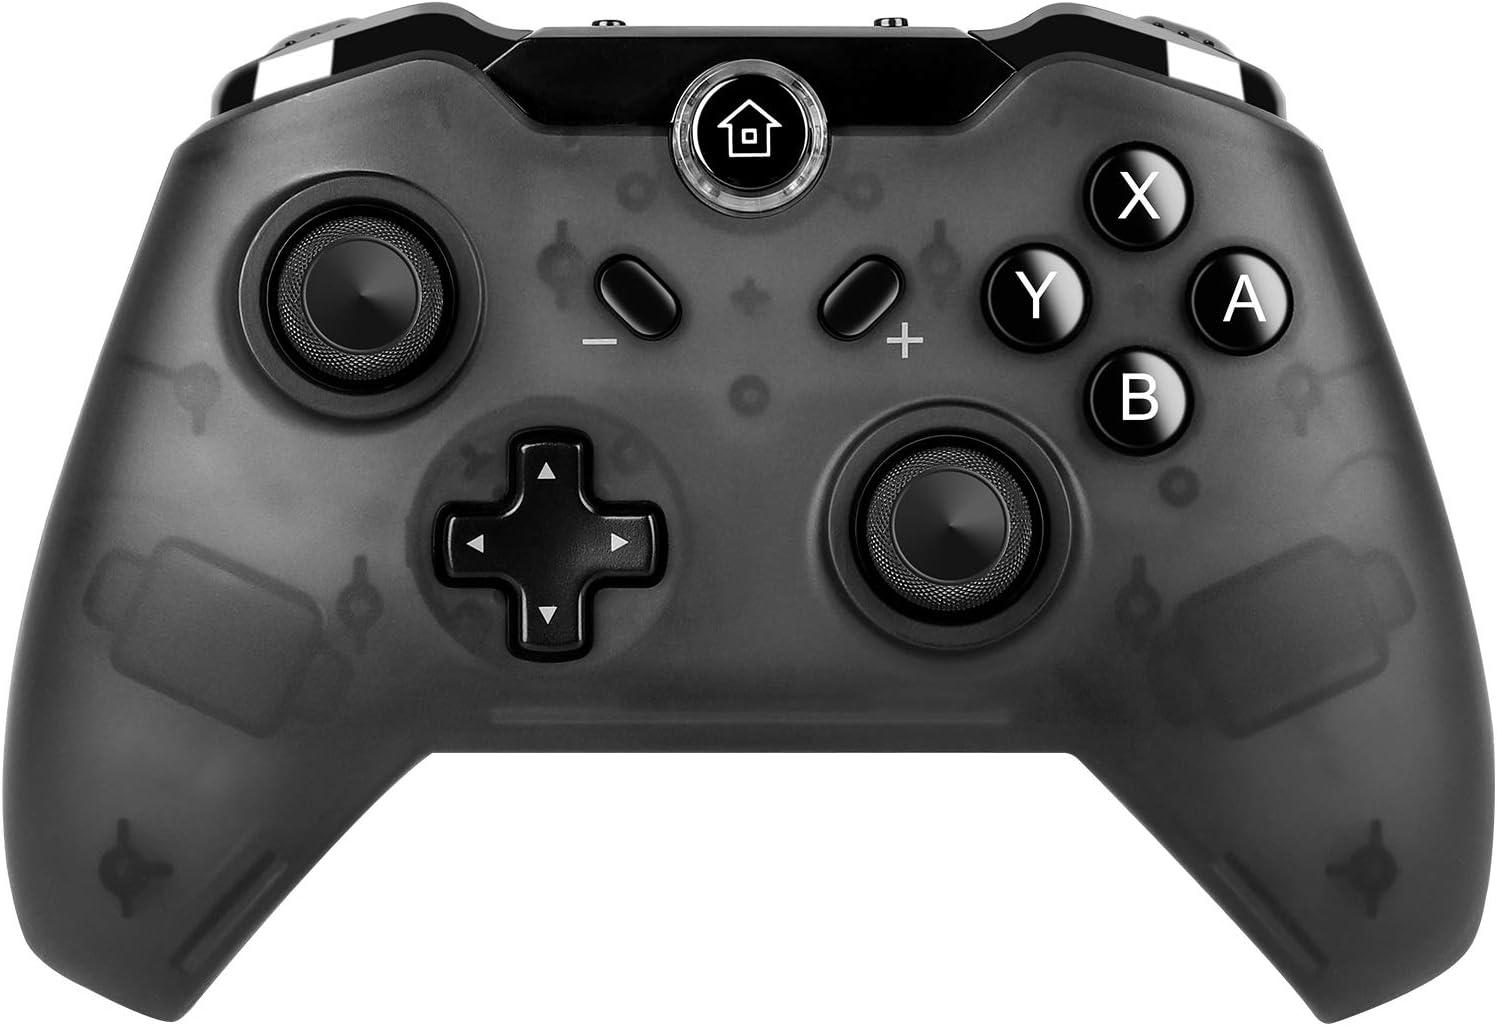 EEEKit Wireless Max 73% OFF Pro Gaming Product Controller Con Gamepad Joypad Remote